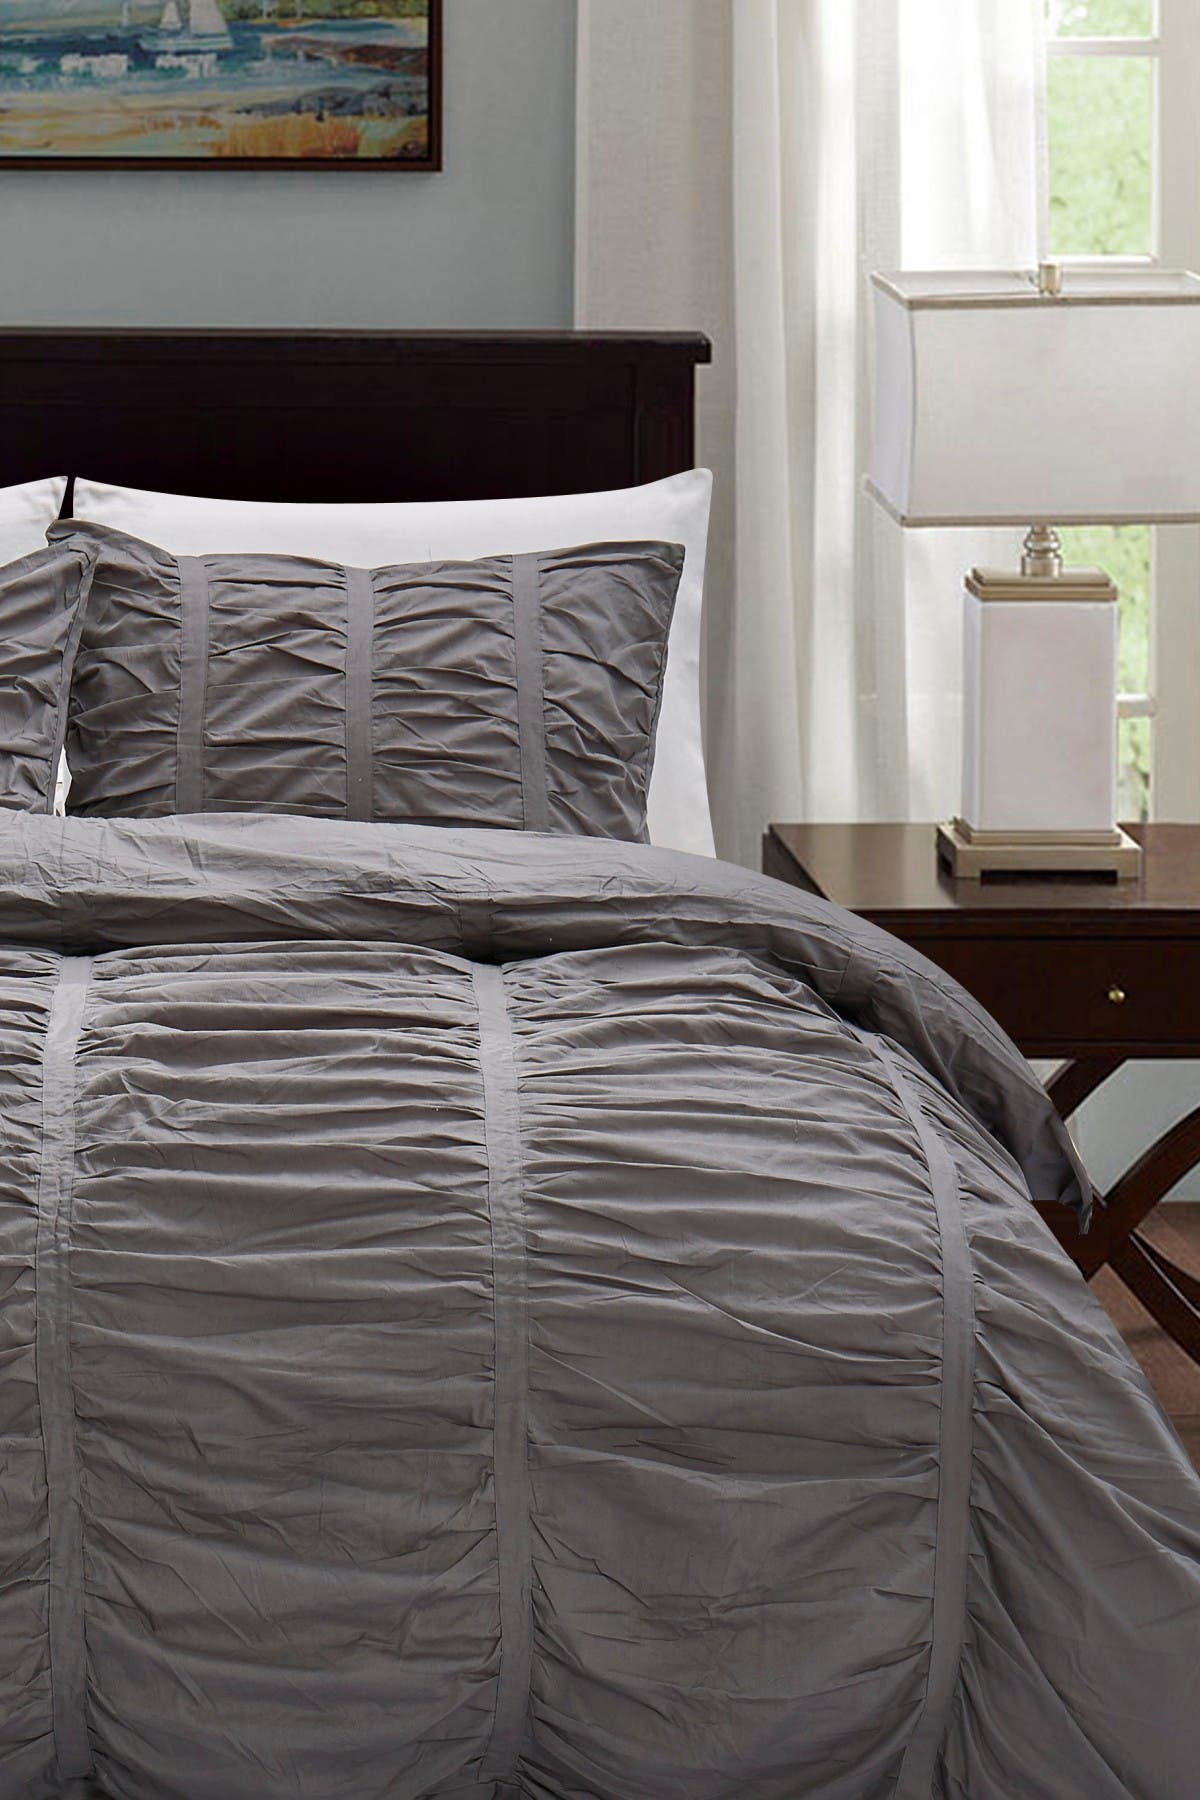 California Design Den King Ruched Gathered Comforter Set Charcoal Gray Nordstrom Rack